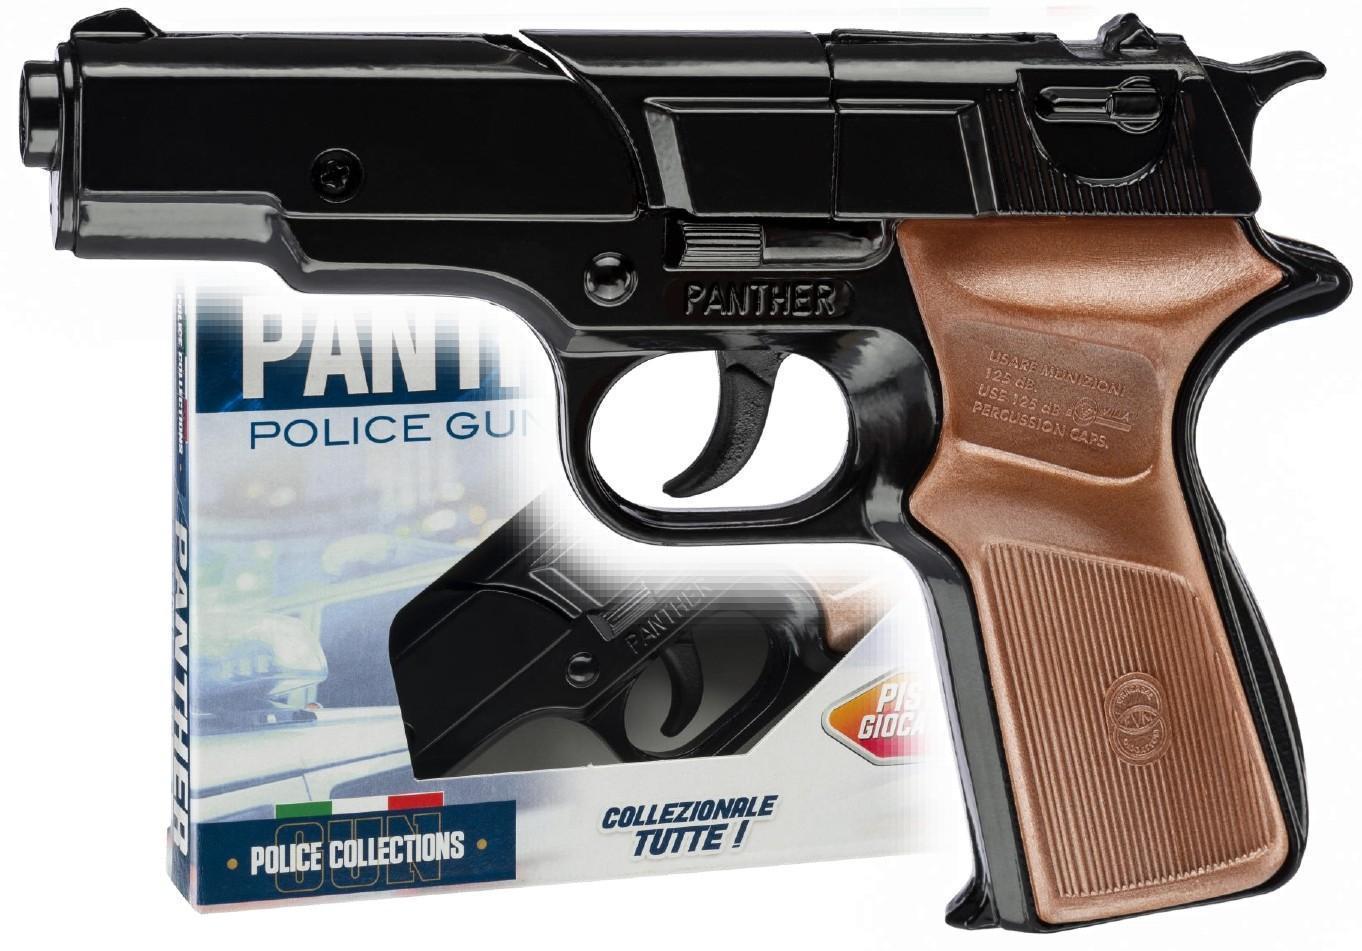 villa giocattoli villa giocattoli pistola police panther 8 colpi 125db